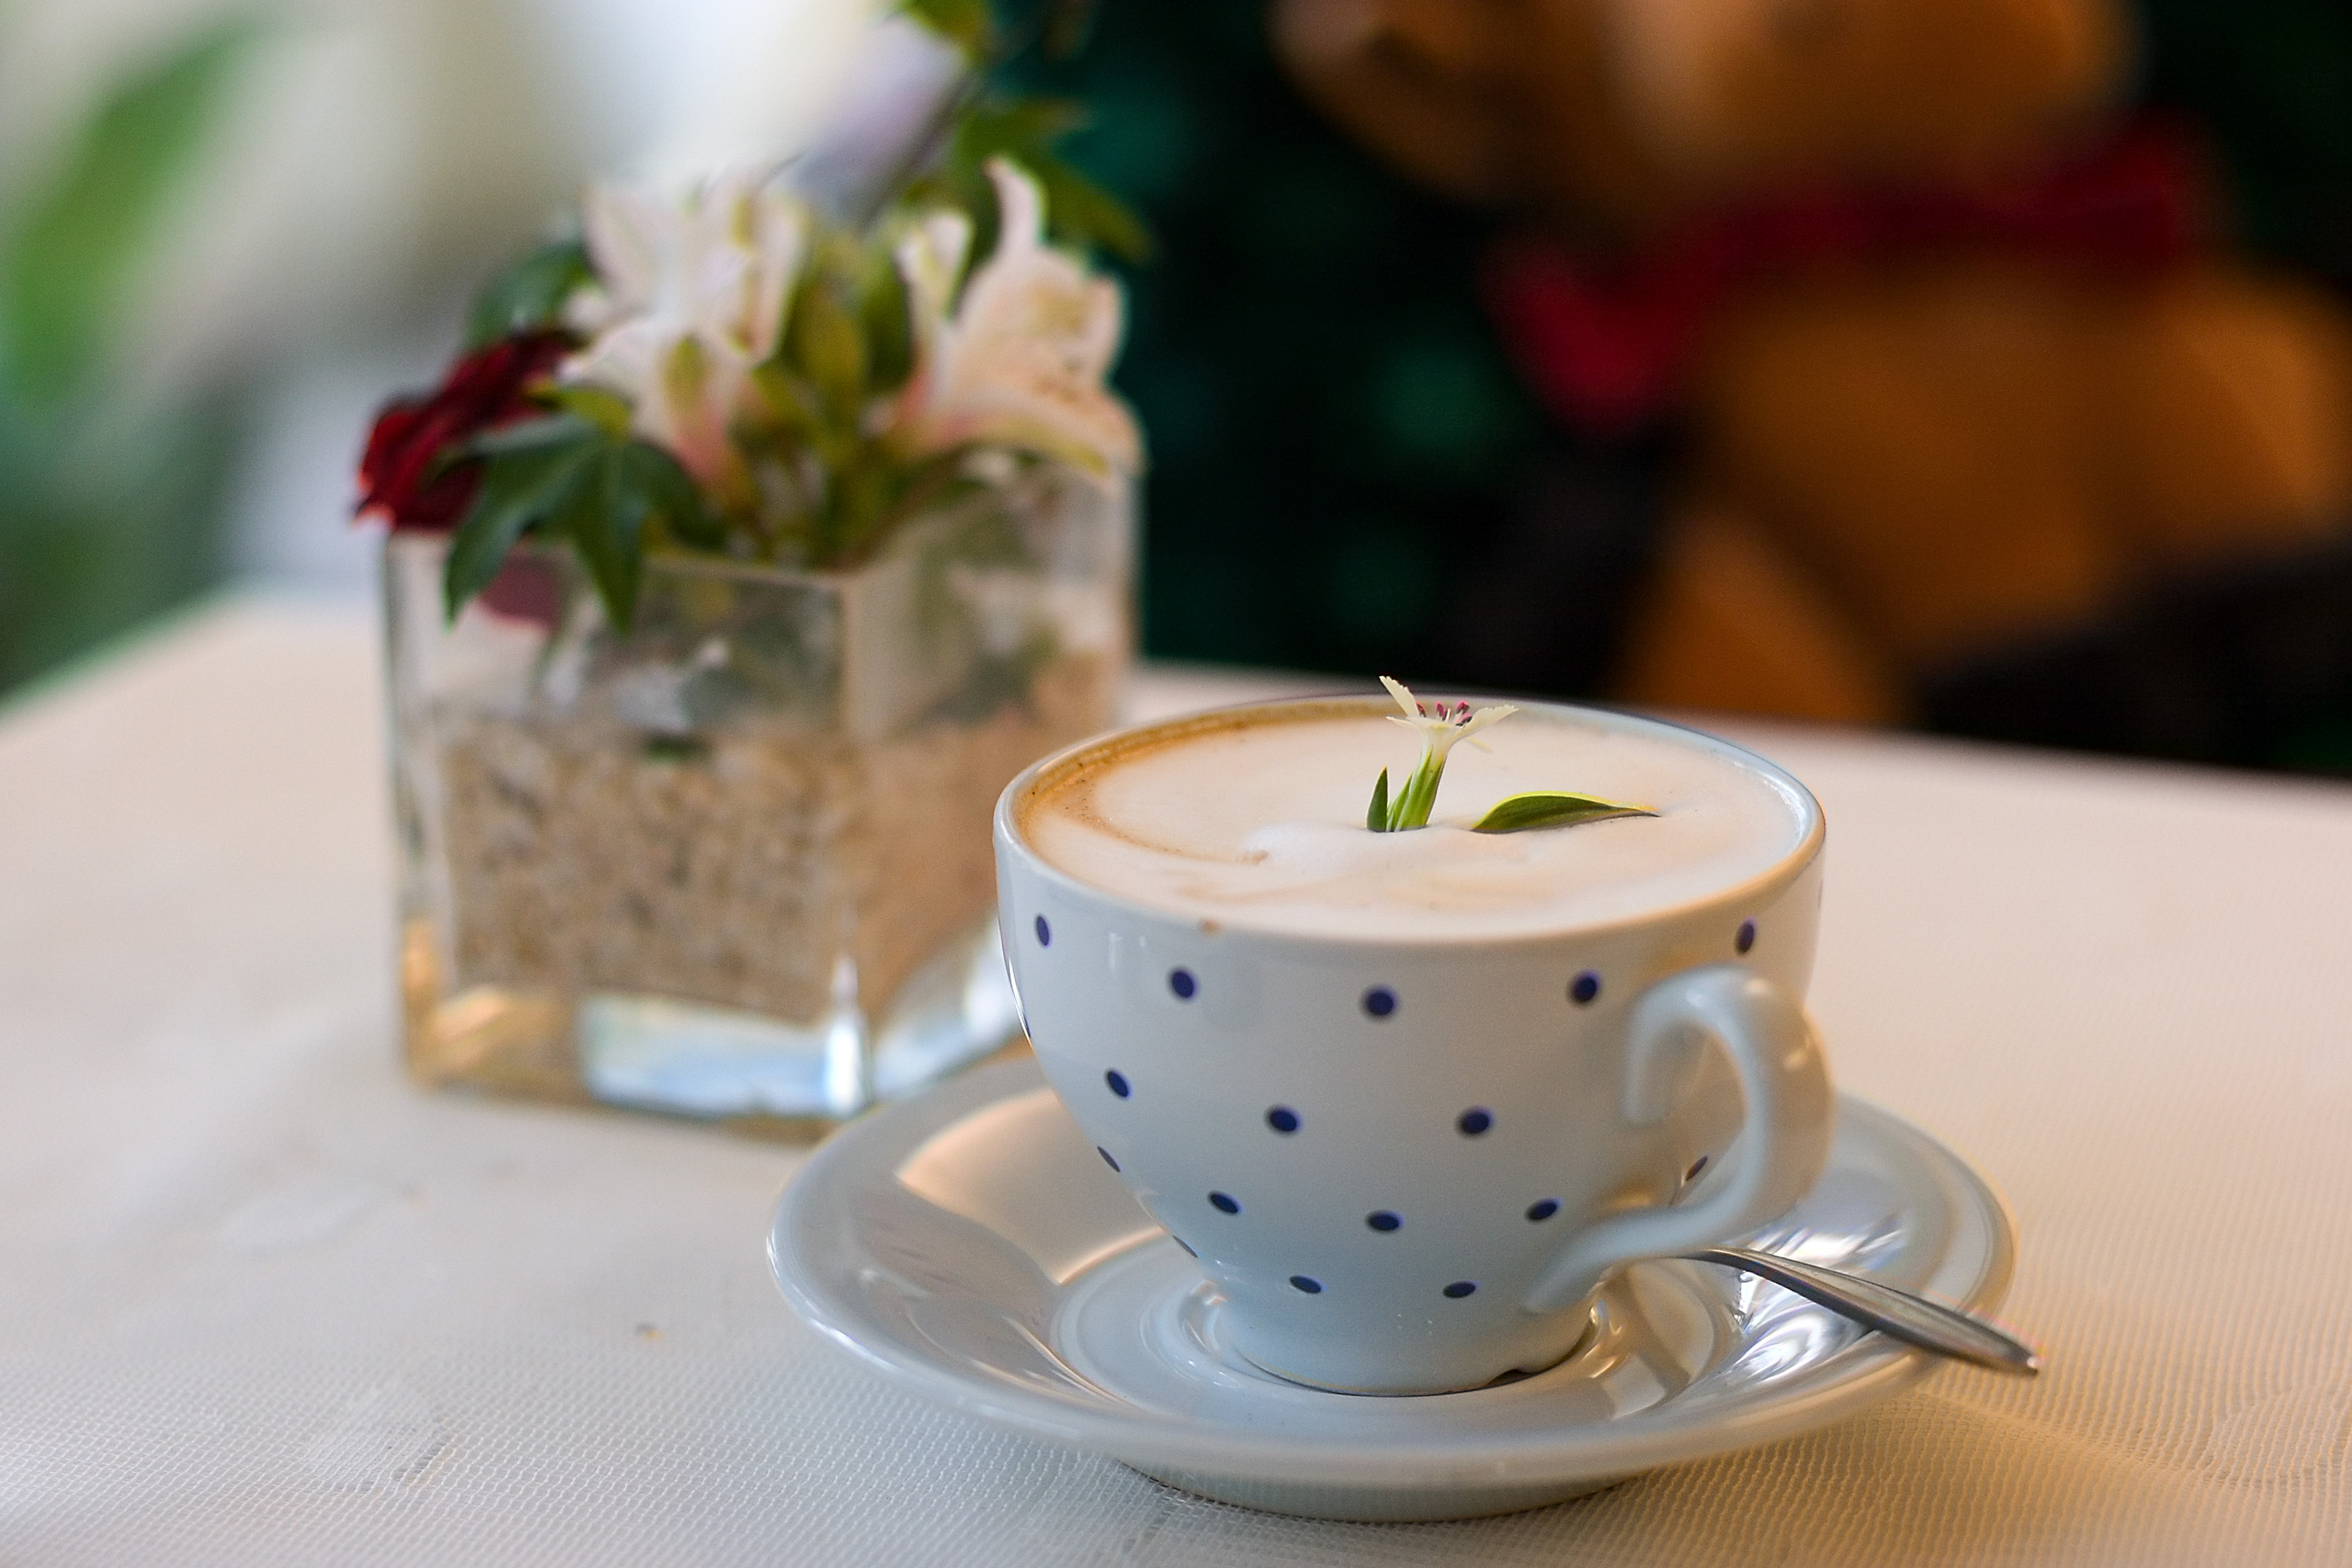 Jamieson S Cafe And Tea Room Oakwood